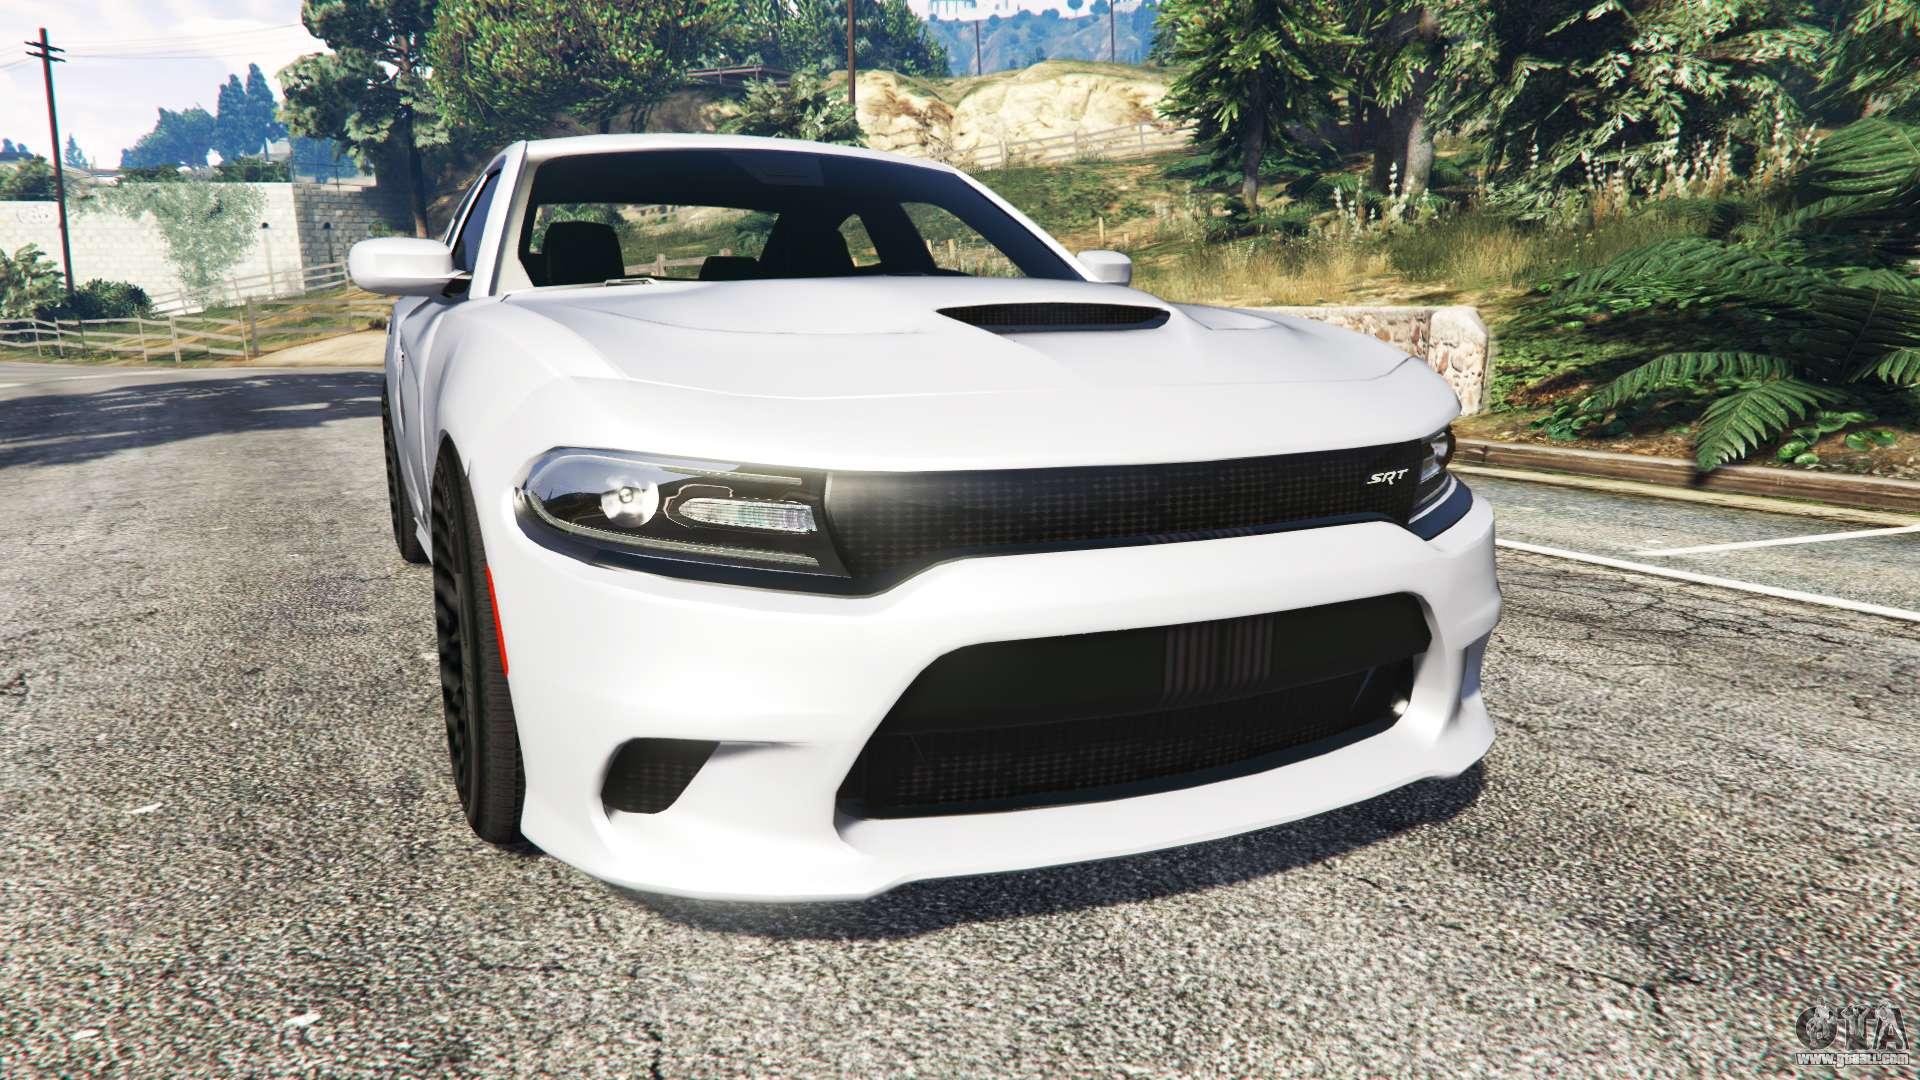 Dodge Charger Srt Hellcat 2015 V1 3 For Gta 5